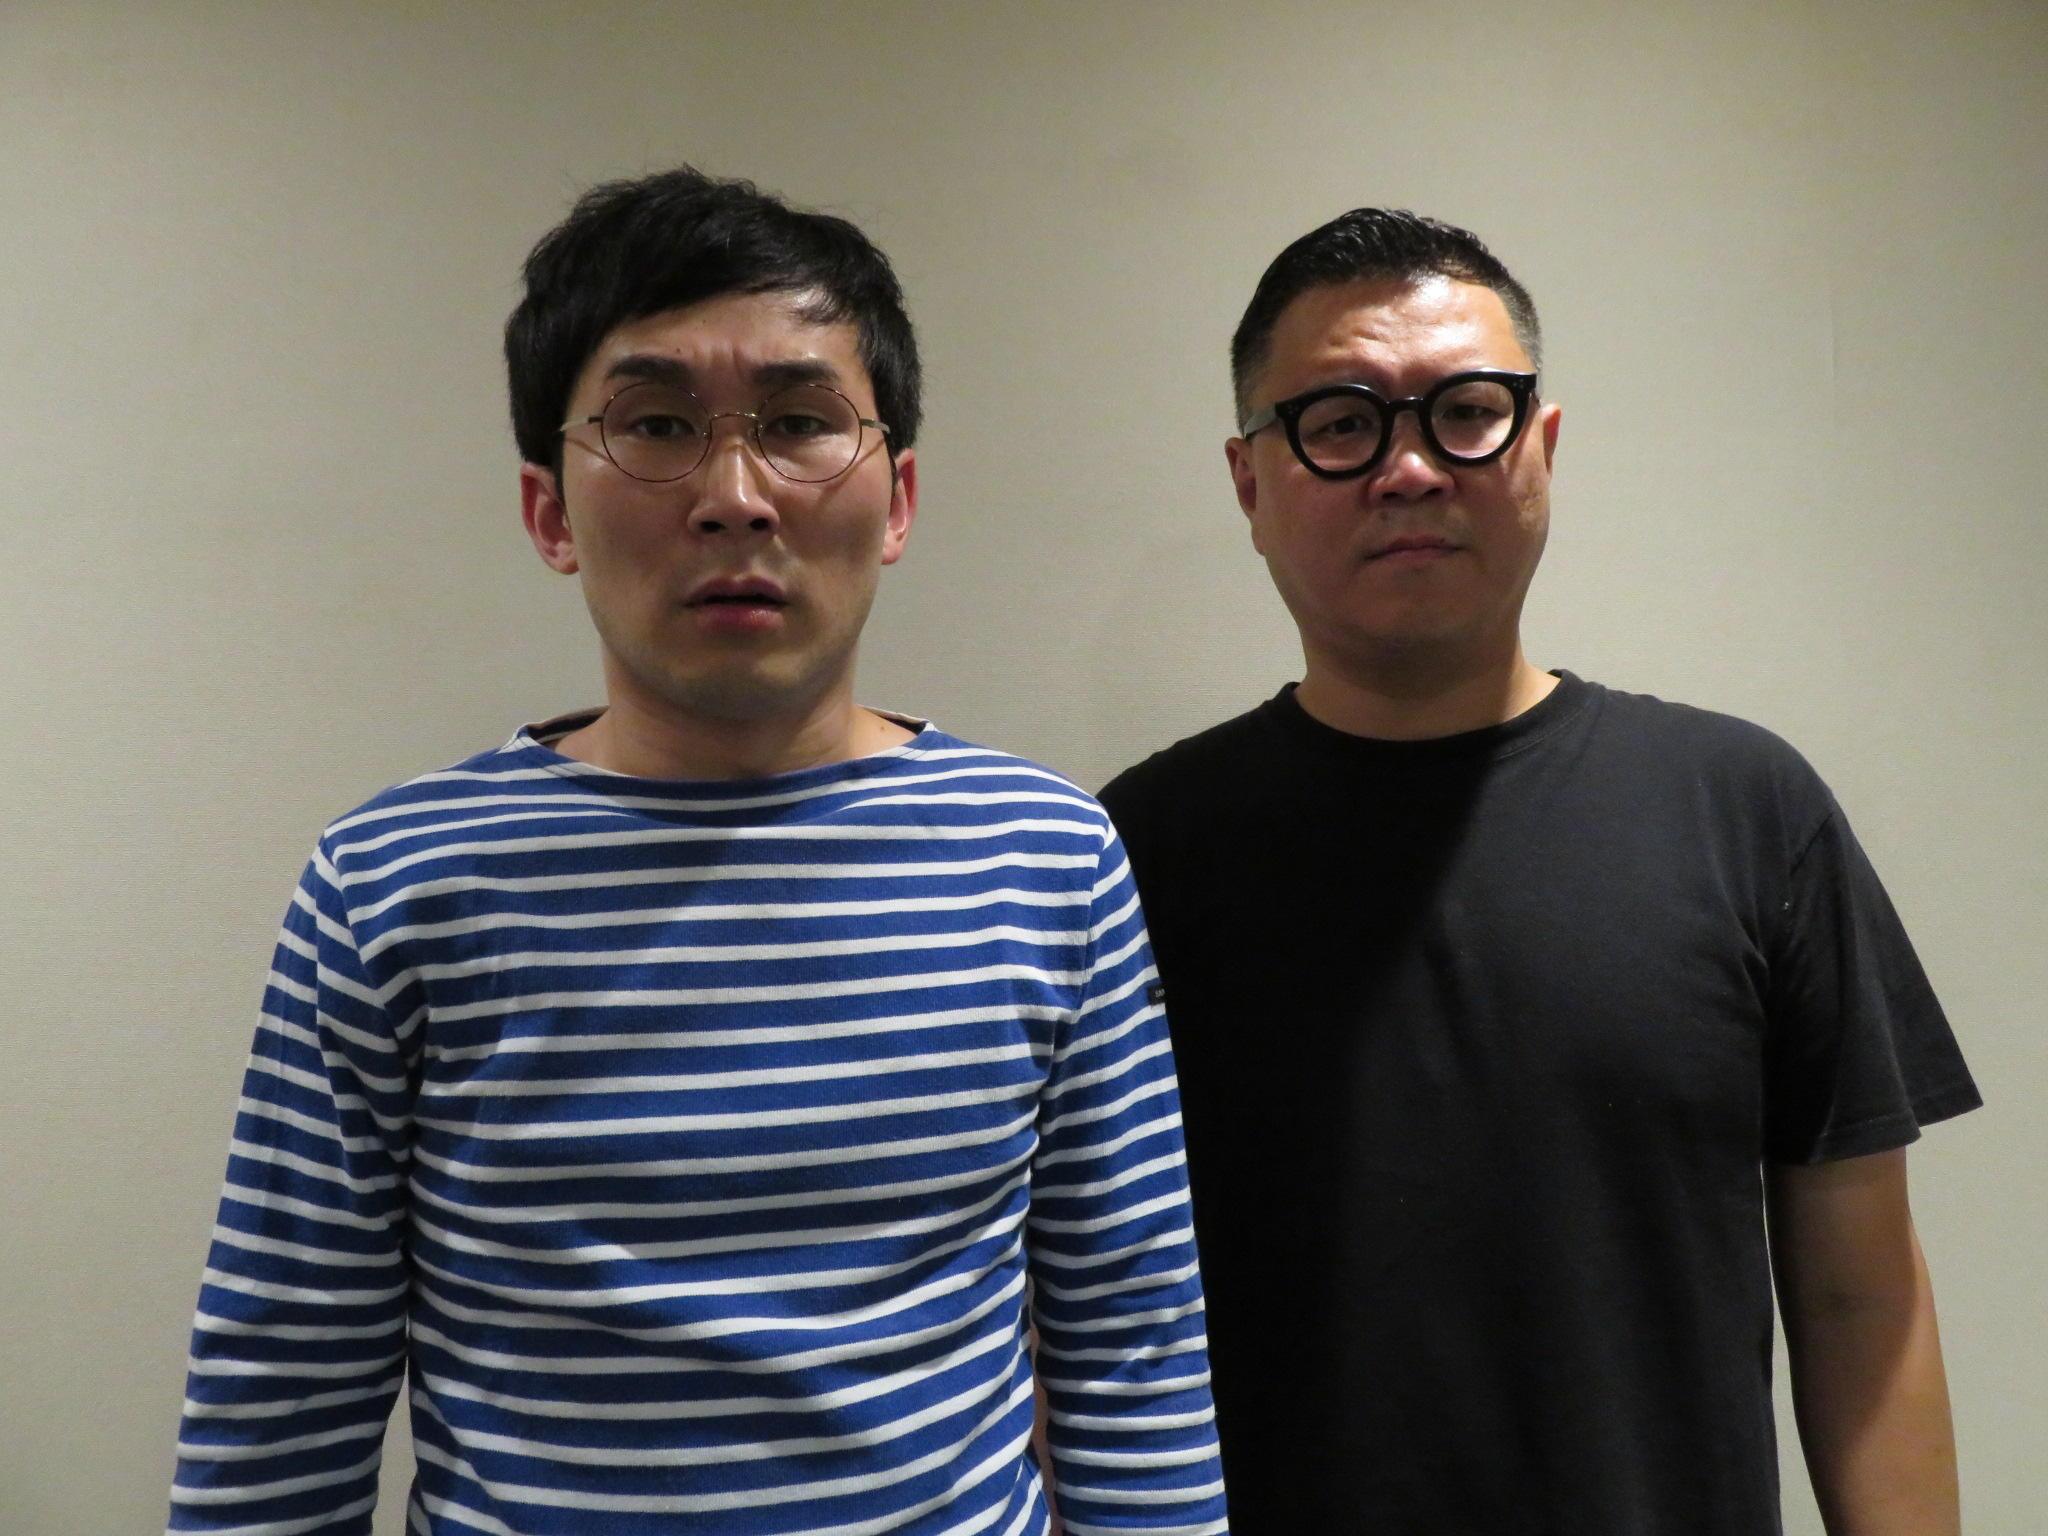 http://news.yoshimoto.co.jp/20190202191911-4a985e408622e304c4e12ad7507a93aff496a142.jpg